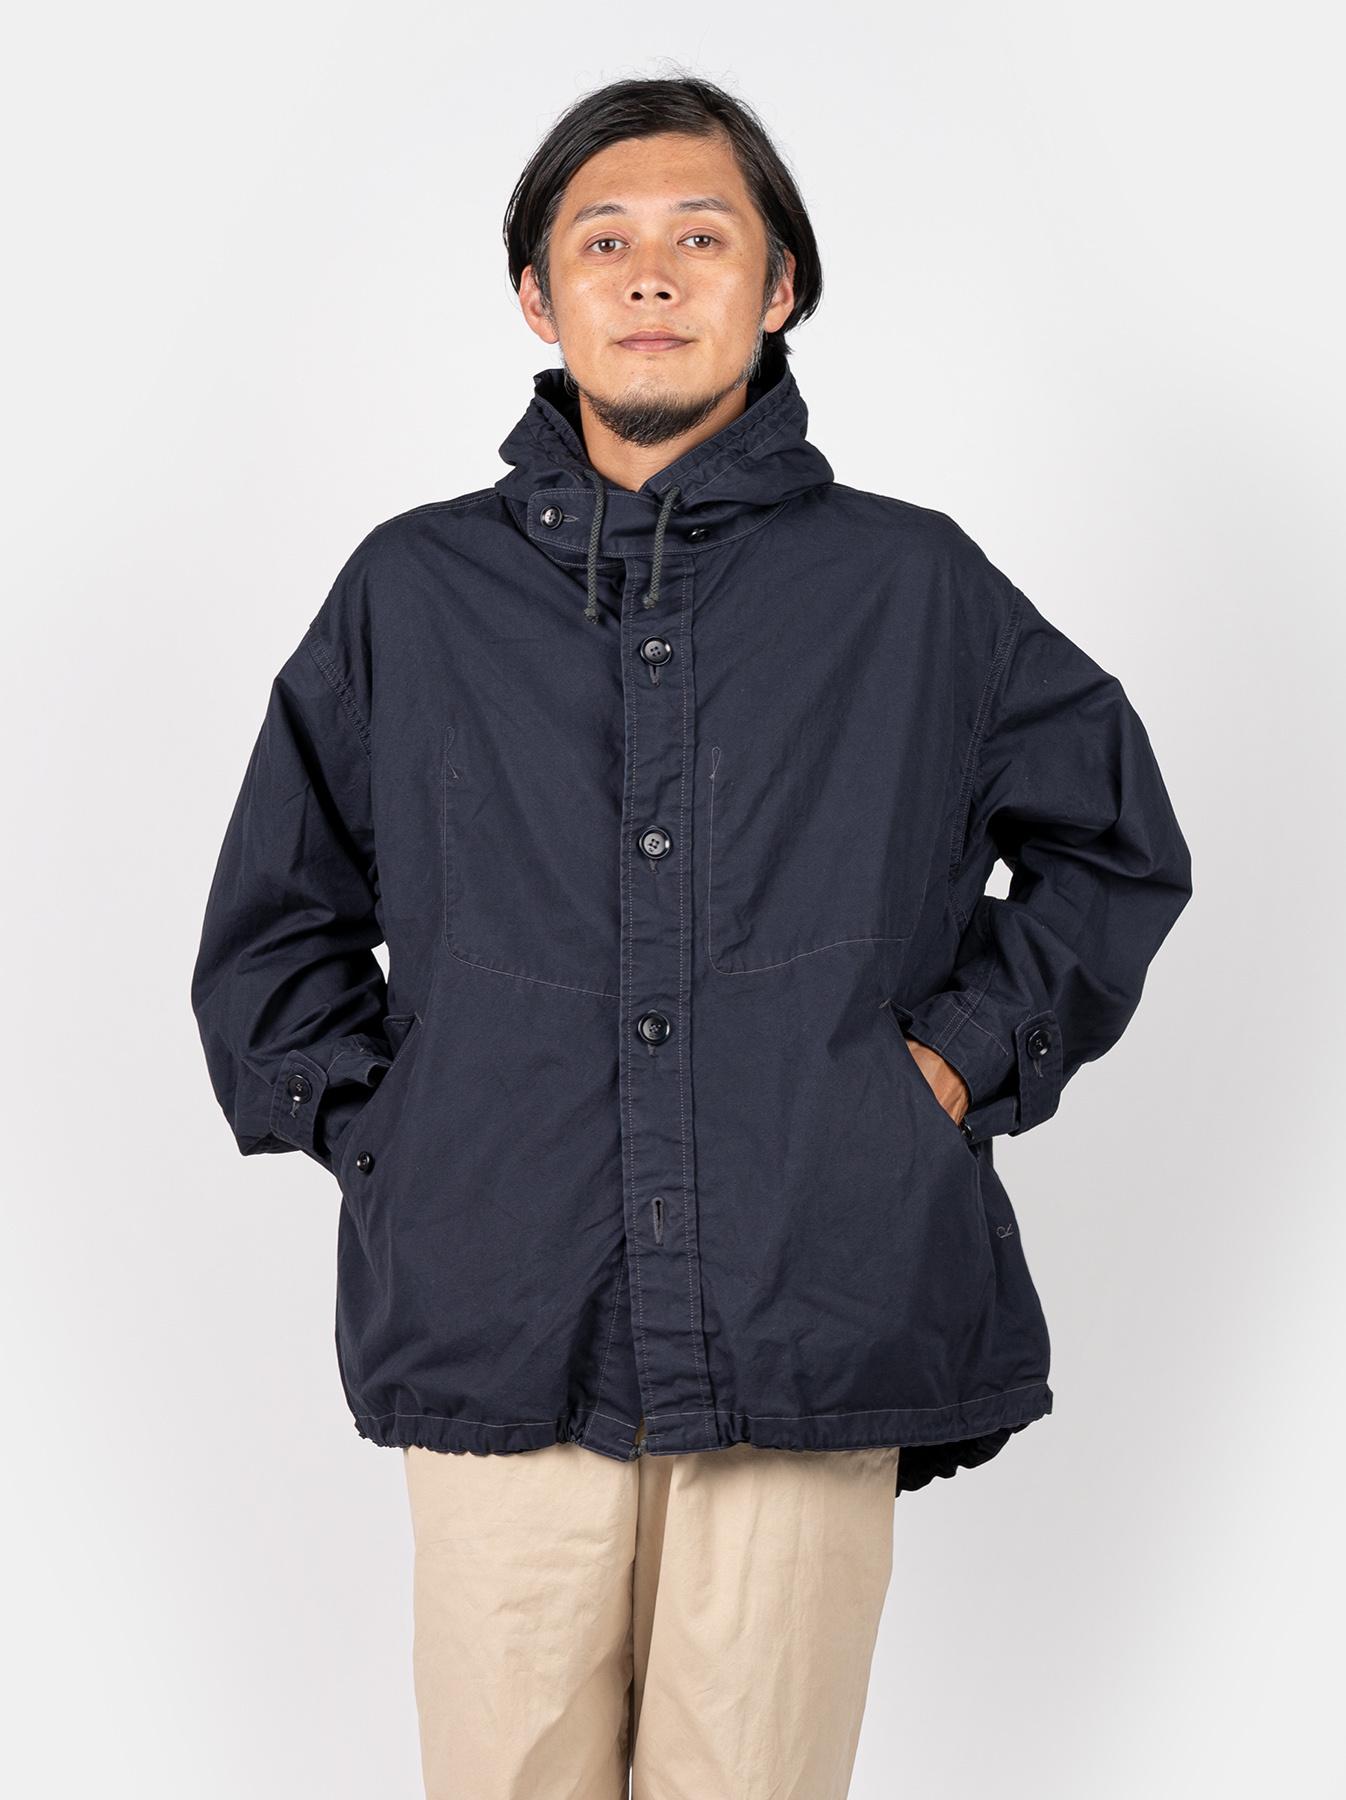 Weather Cloth Umahiko Mods Hoodie-3